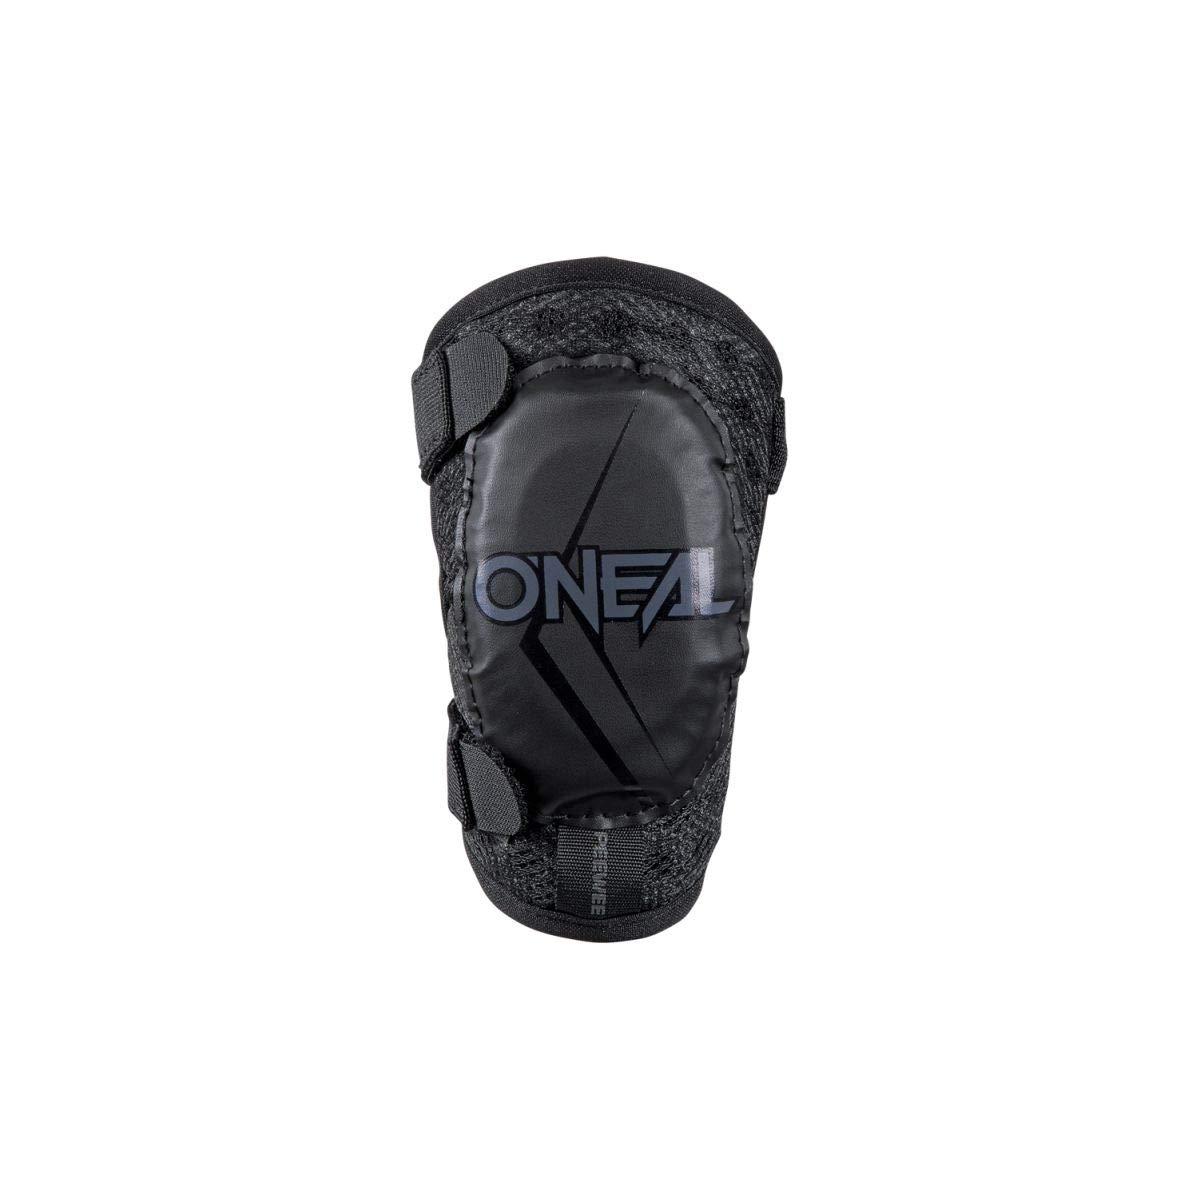 O'Neal Pee Wee Elbow Guards (Small/Medium) (Black) O' Neal 0251-310